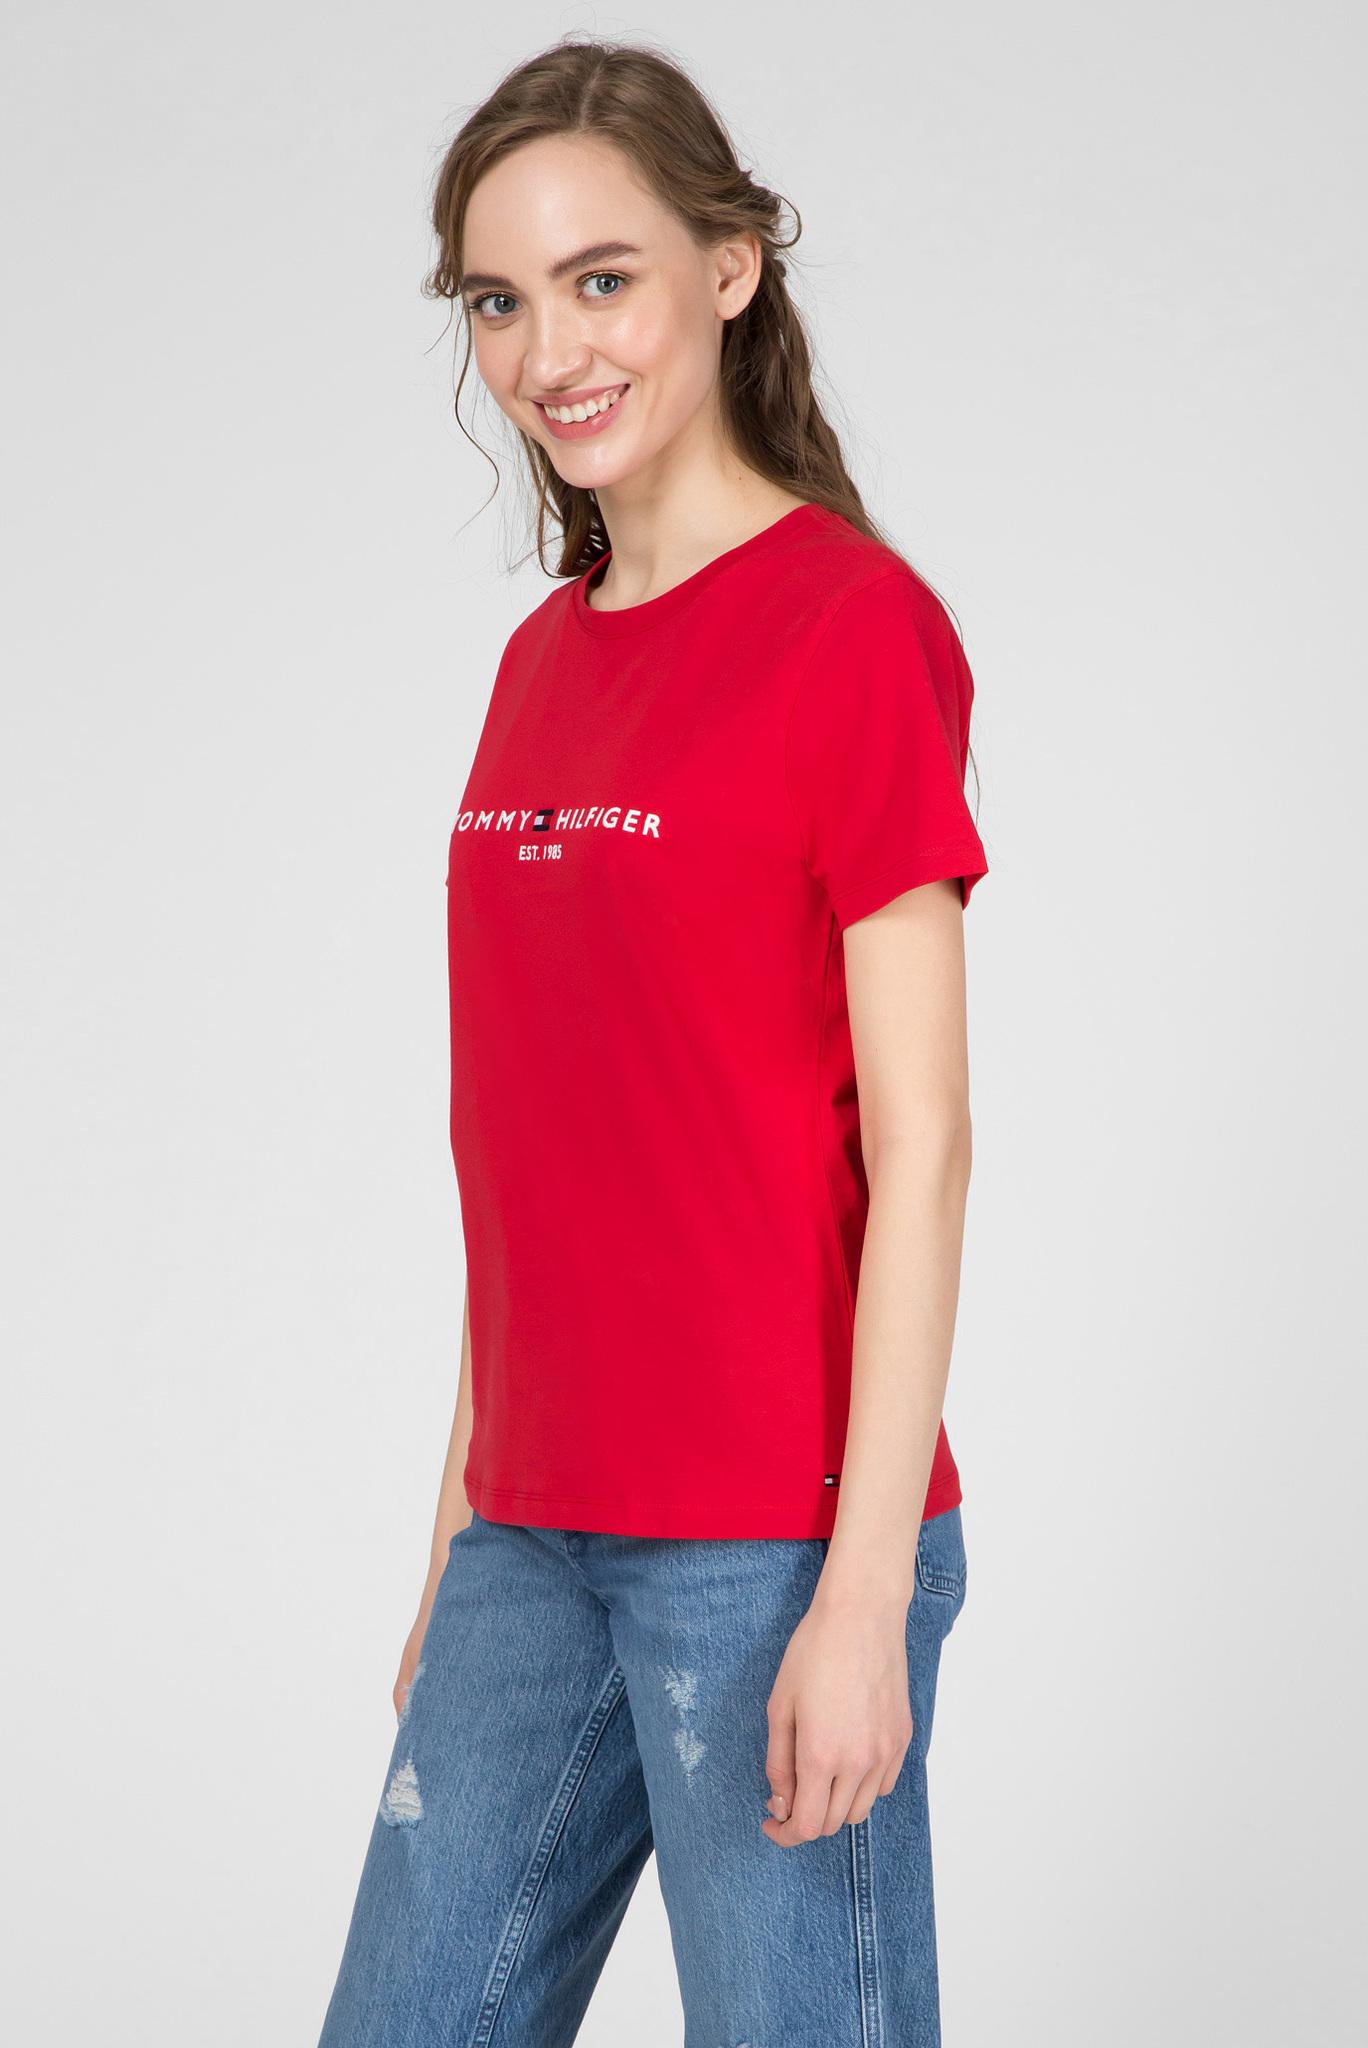 Женская красная футболка NEW TH ESS Tommy Hilfiger